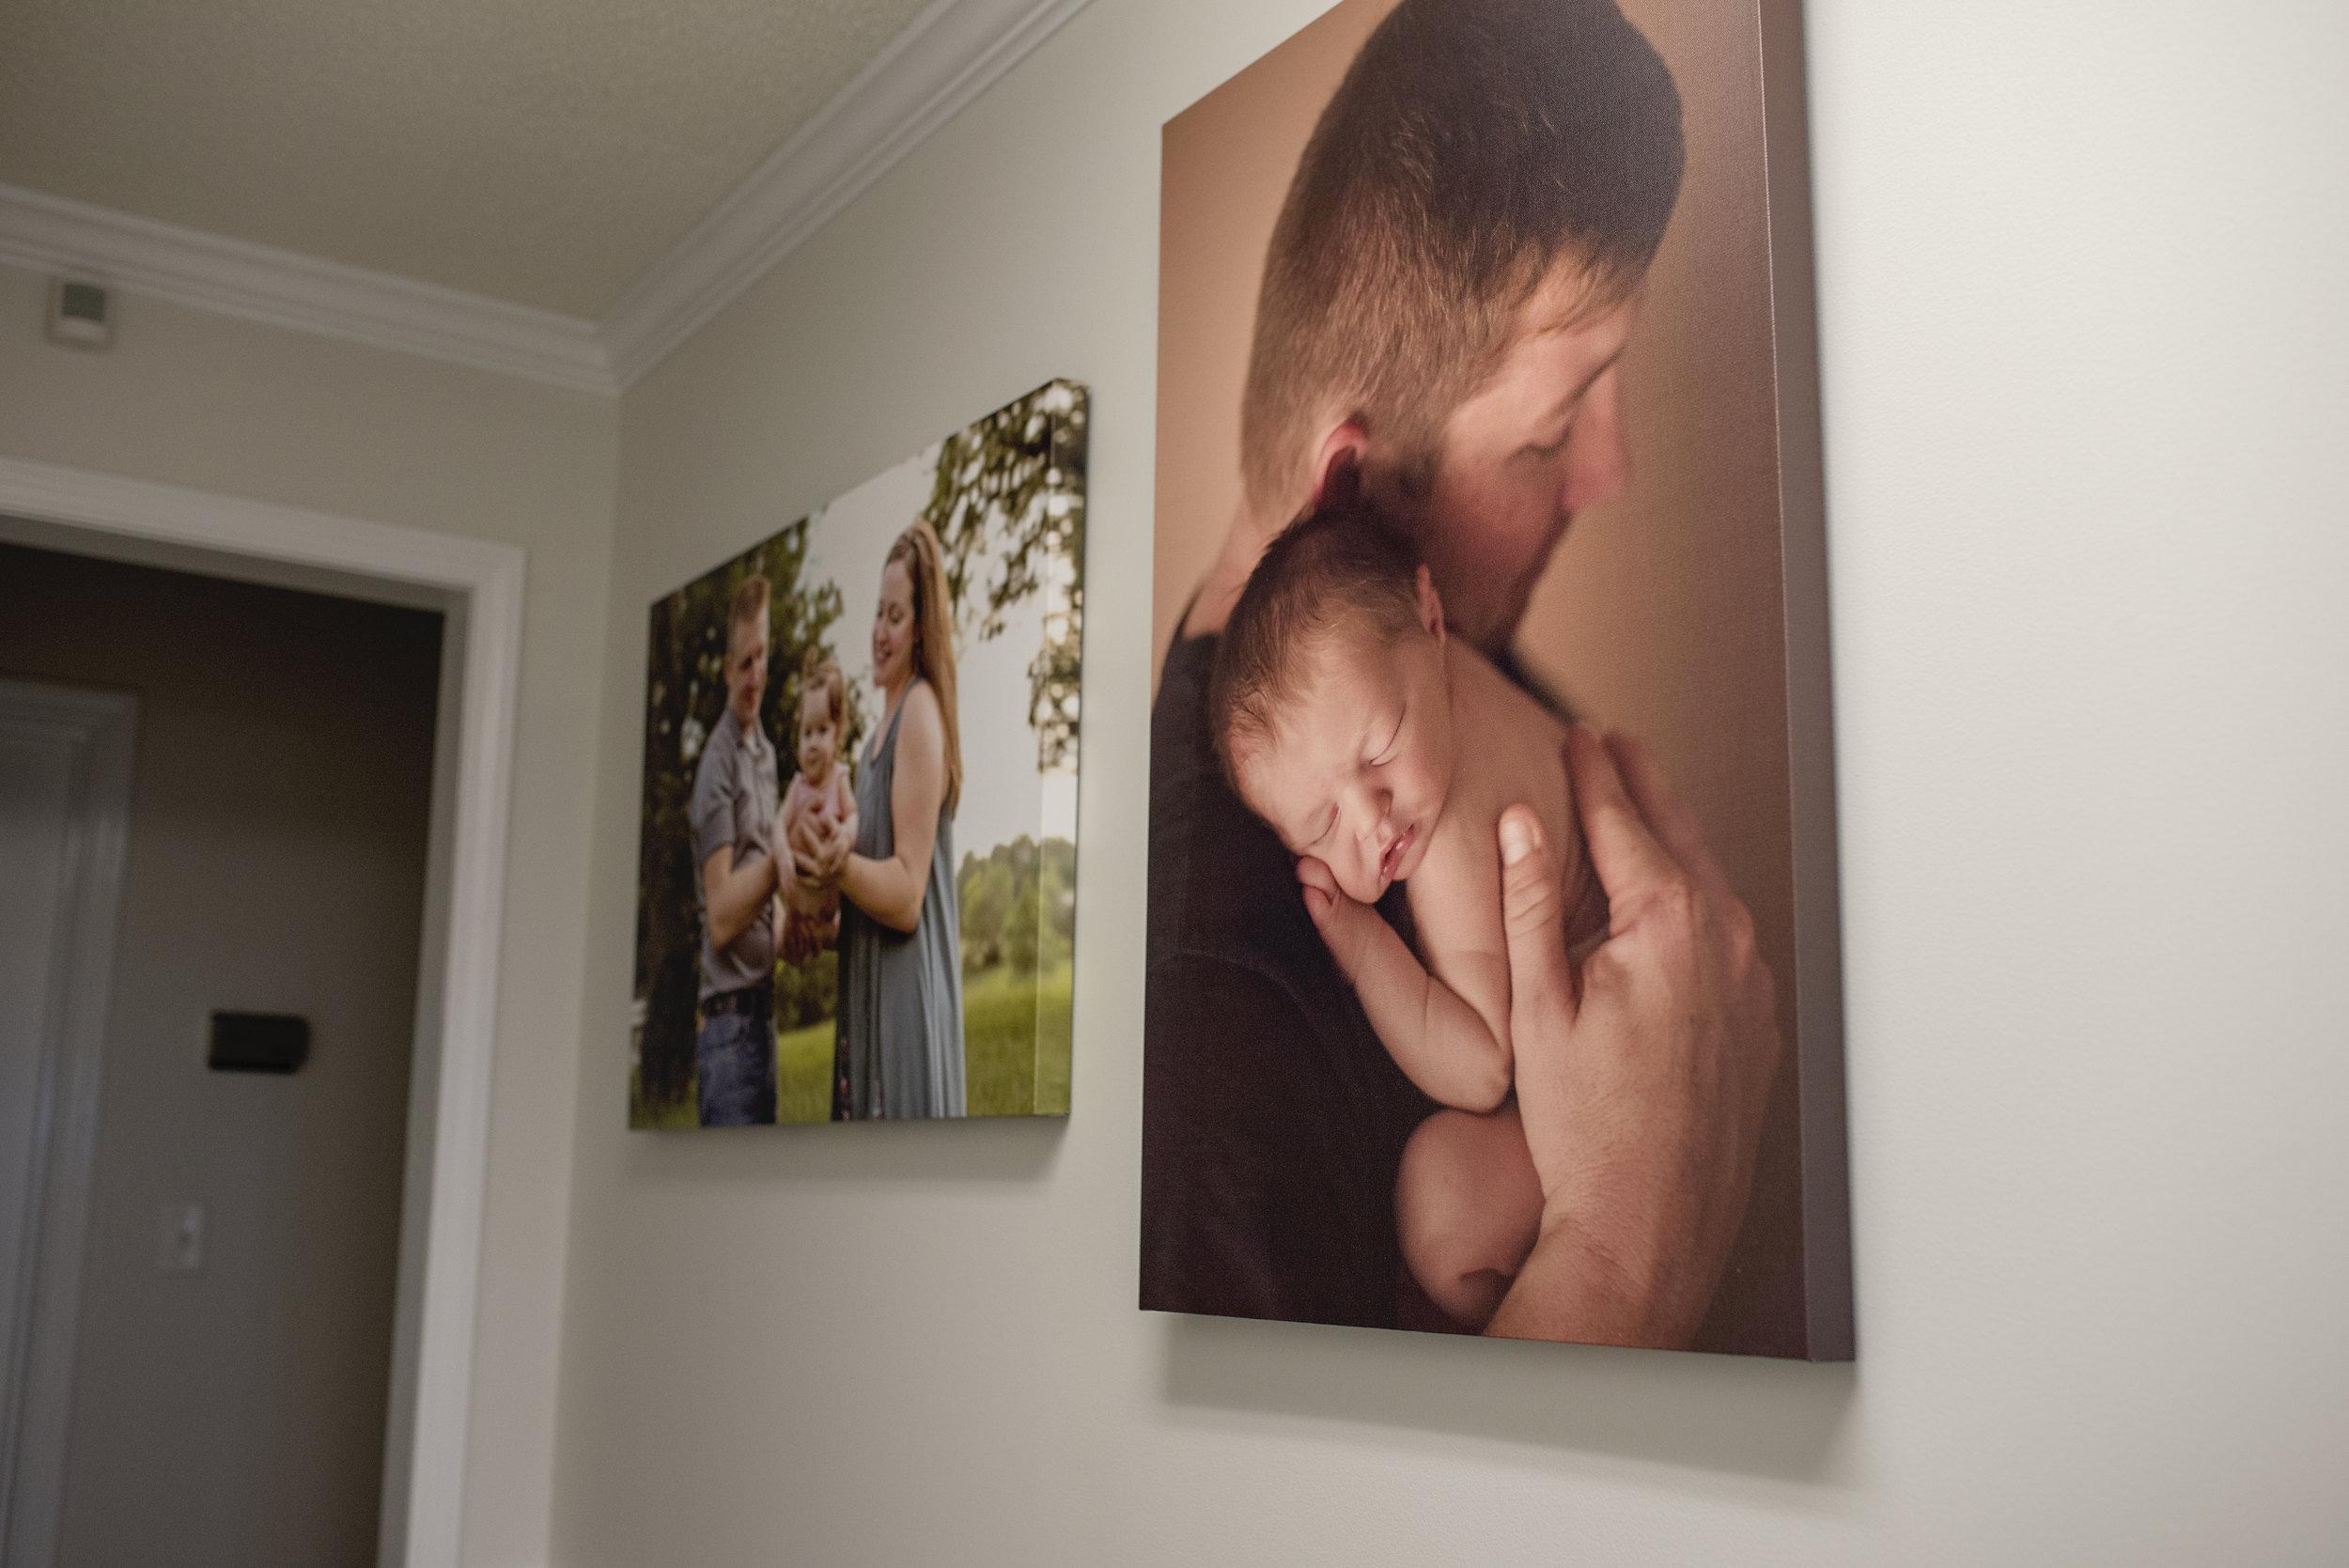 Warner Robins Birth Photographer, Warner Robins Newborn Photographer, Warner Robins Newborn Studio